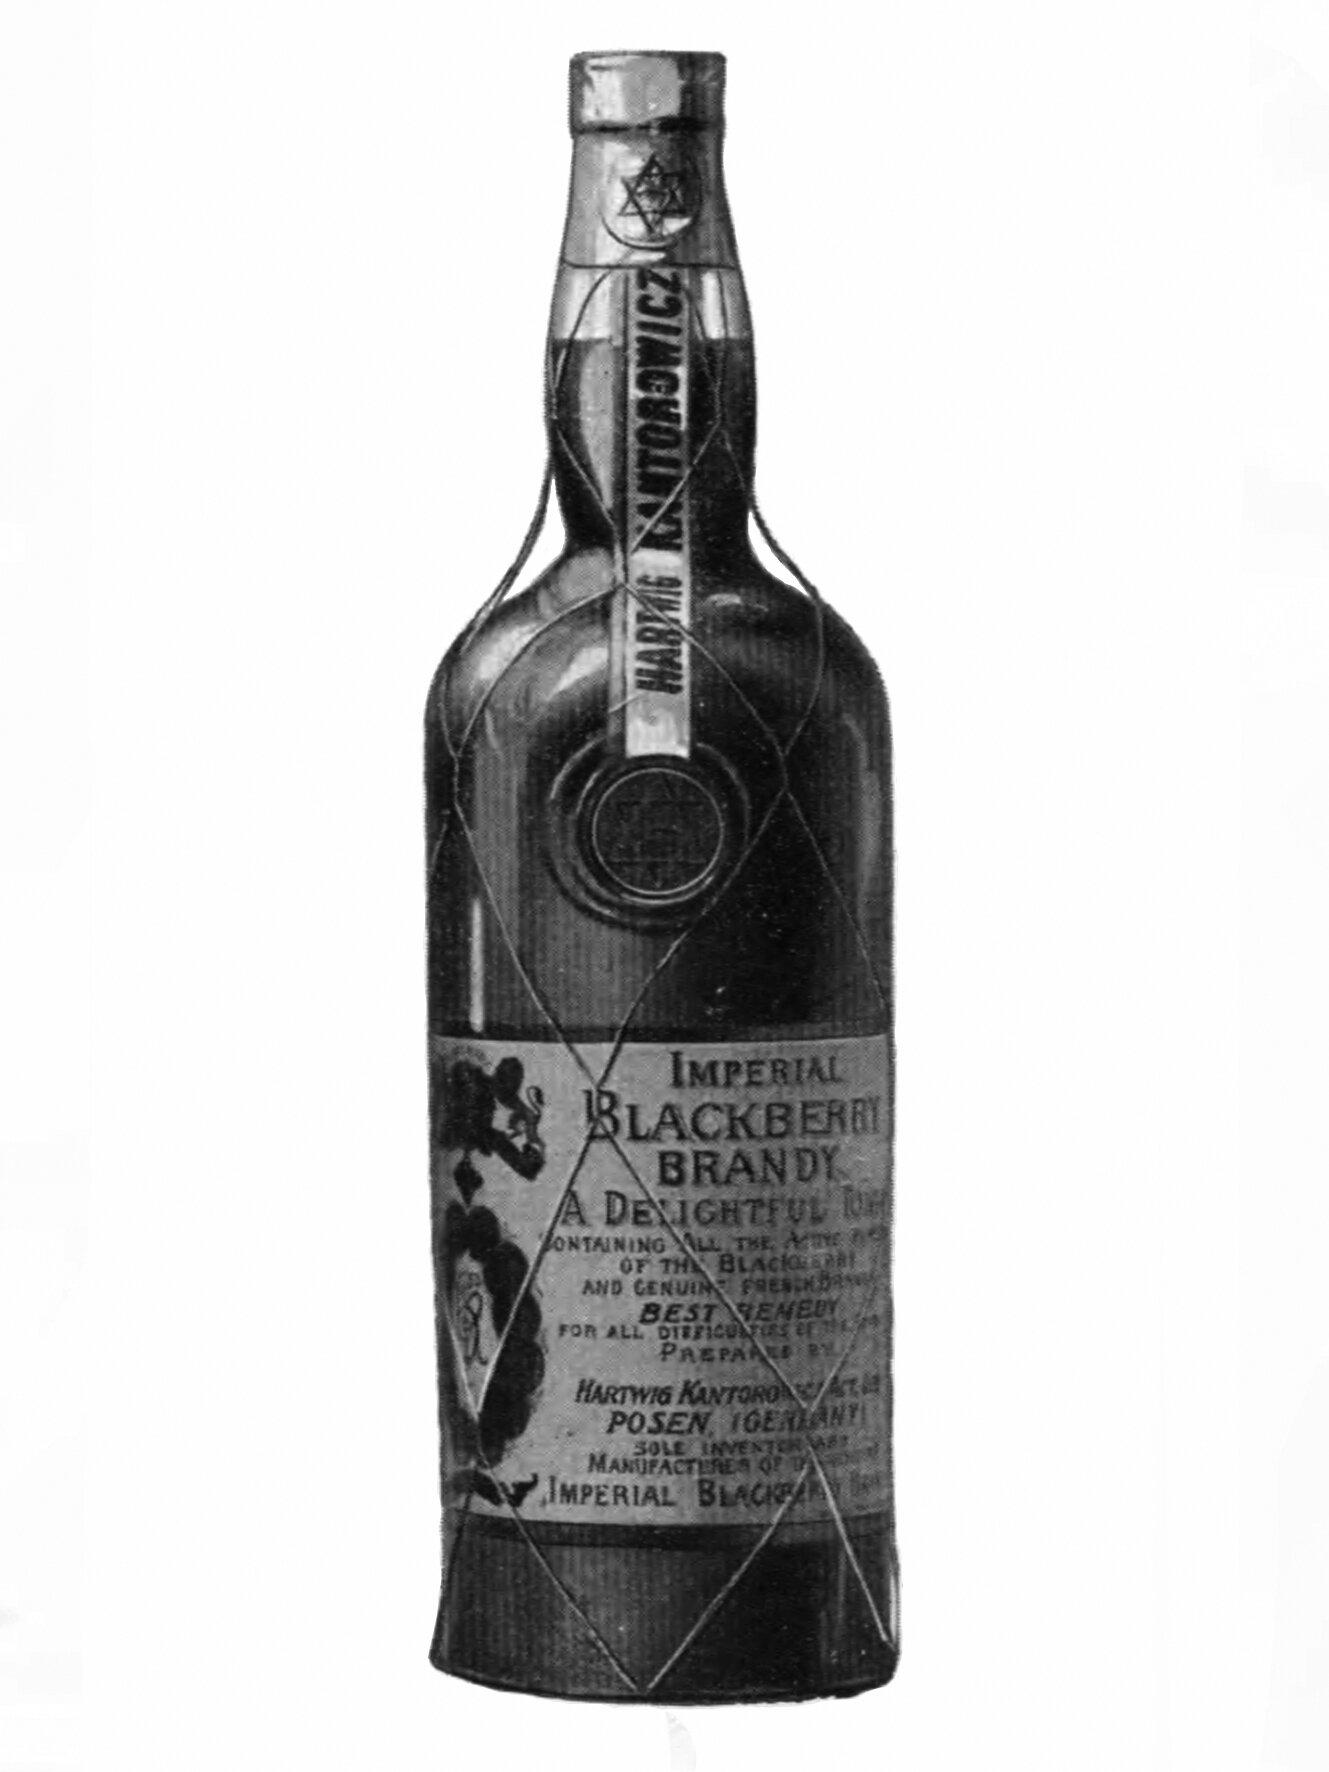 Kantorowicz Imperial Blackberry Brandy, © Gerhard Schneider, Leipzig